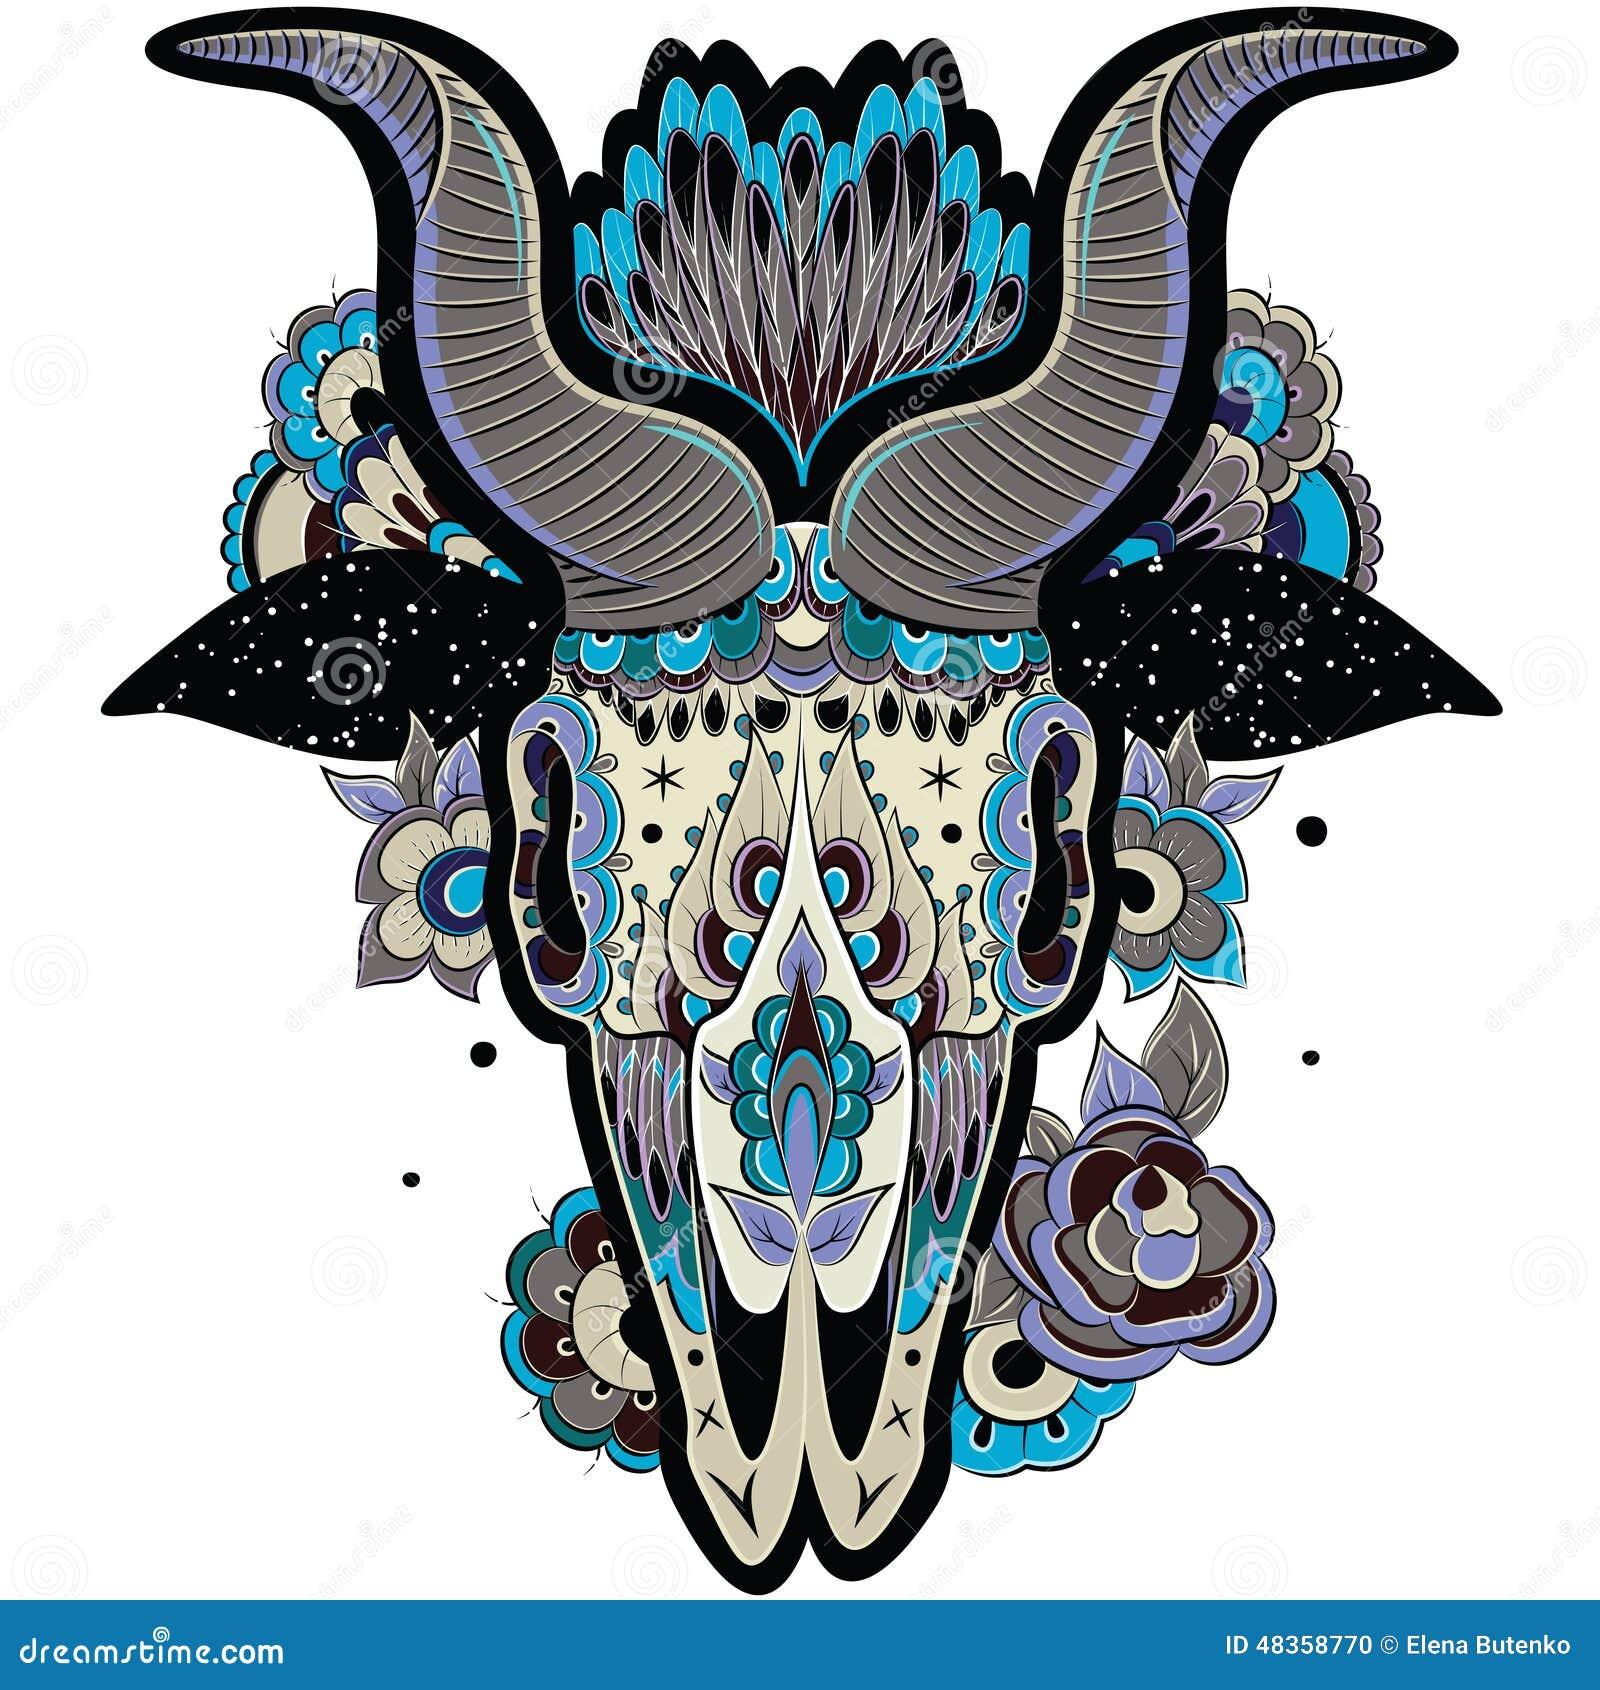 Cool Tattoo Backgrounds: Cool Goat Skull Stock Vector. Illustration Of Decor